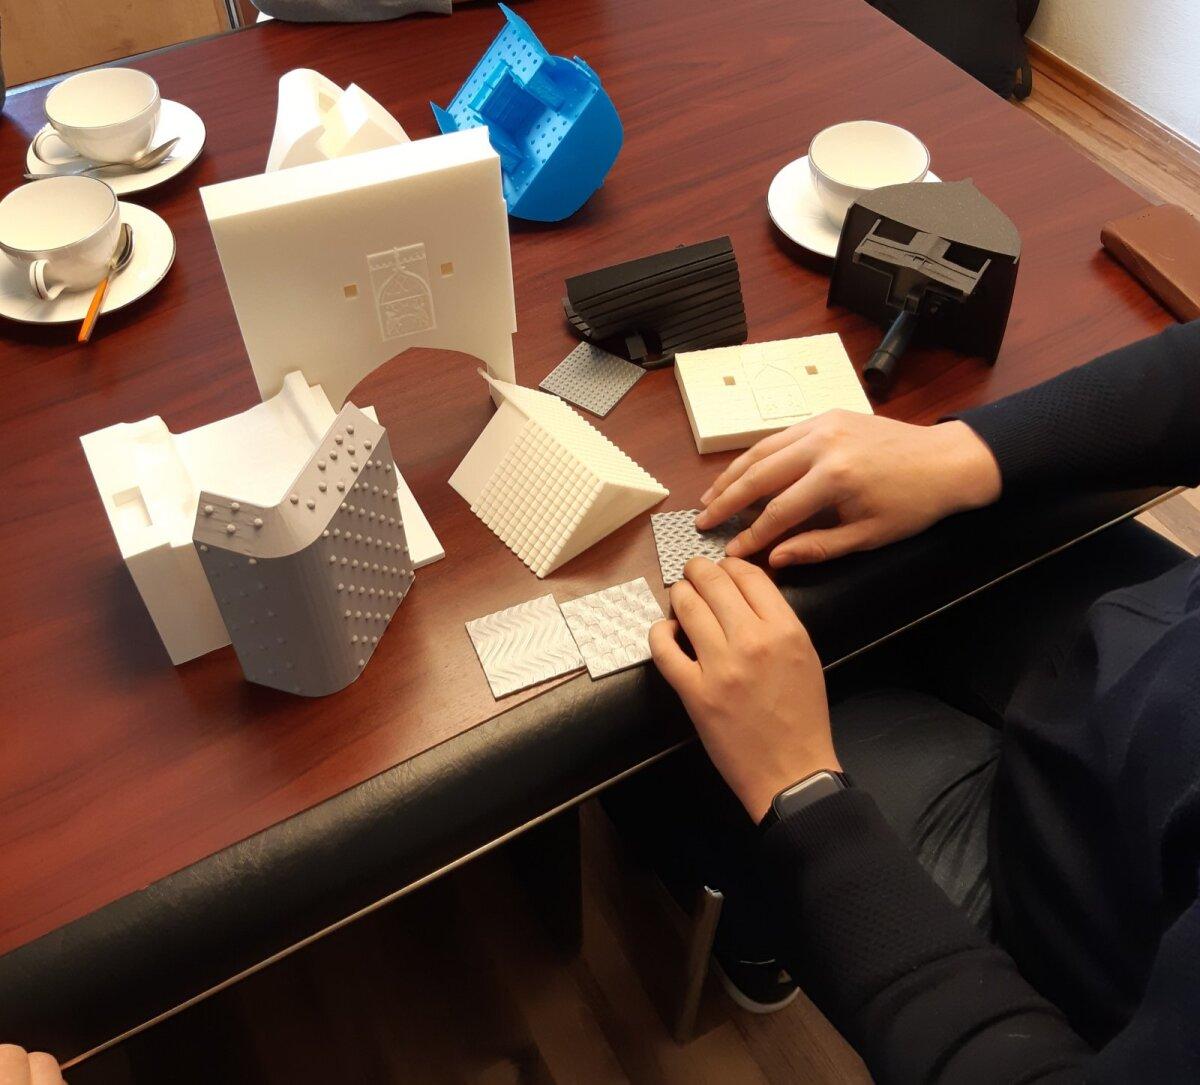 Jakob Rosin testimas erinevaid 3D prinditud laevamudeli fragmente.